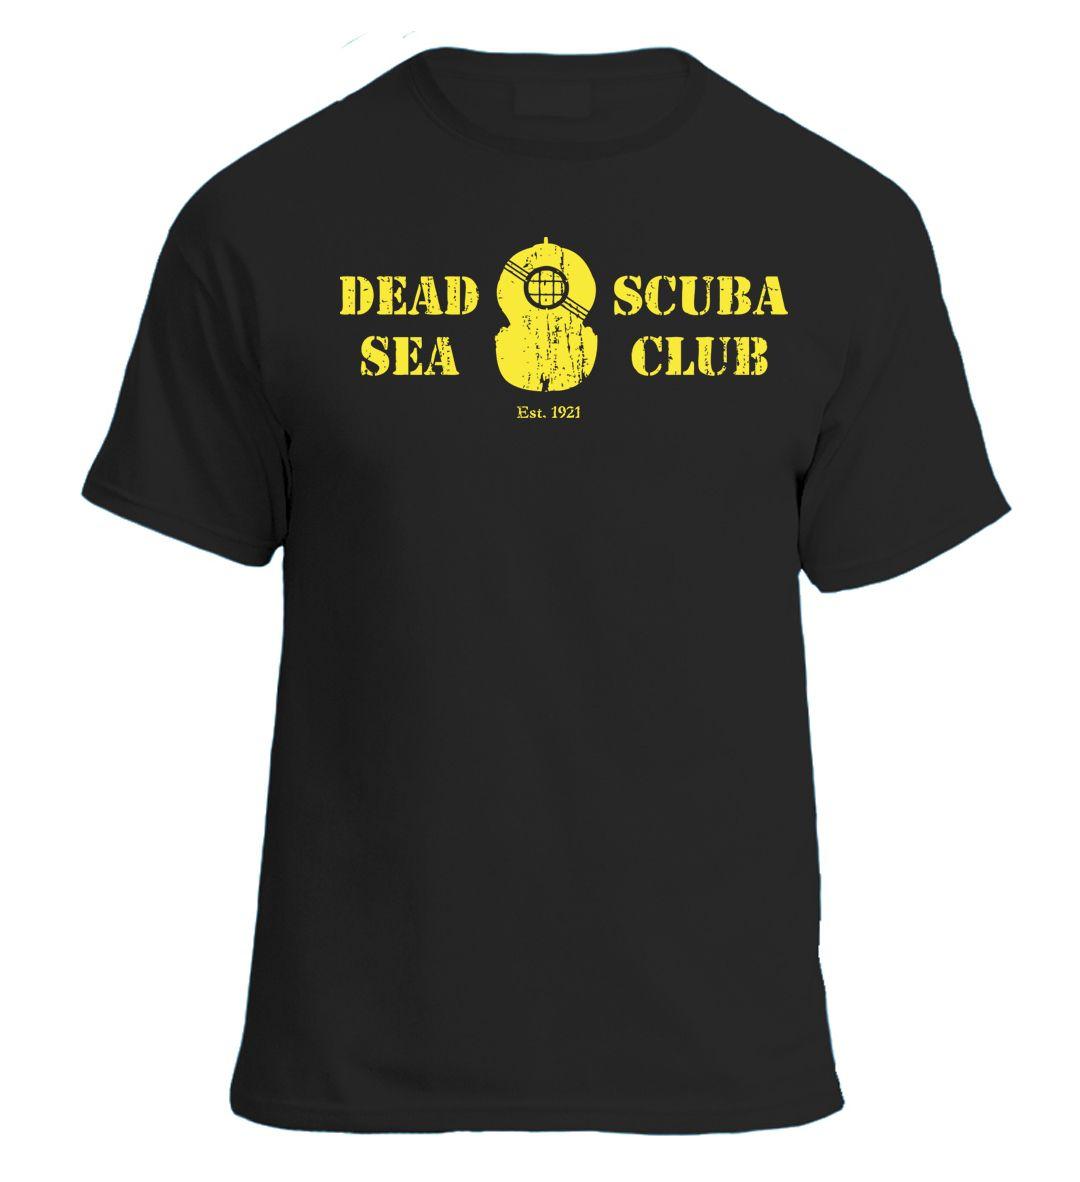 Dead Sea Scuba Club Tee men's